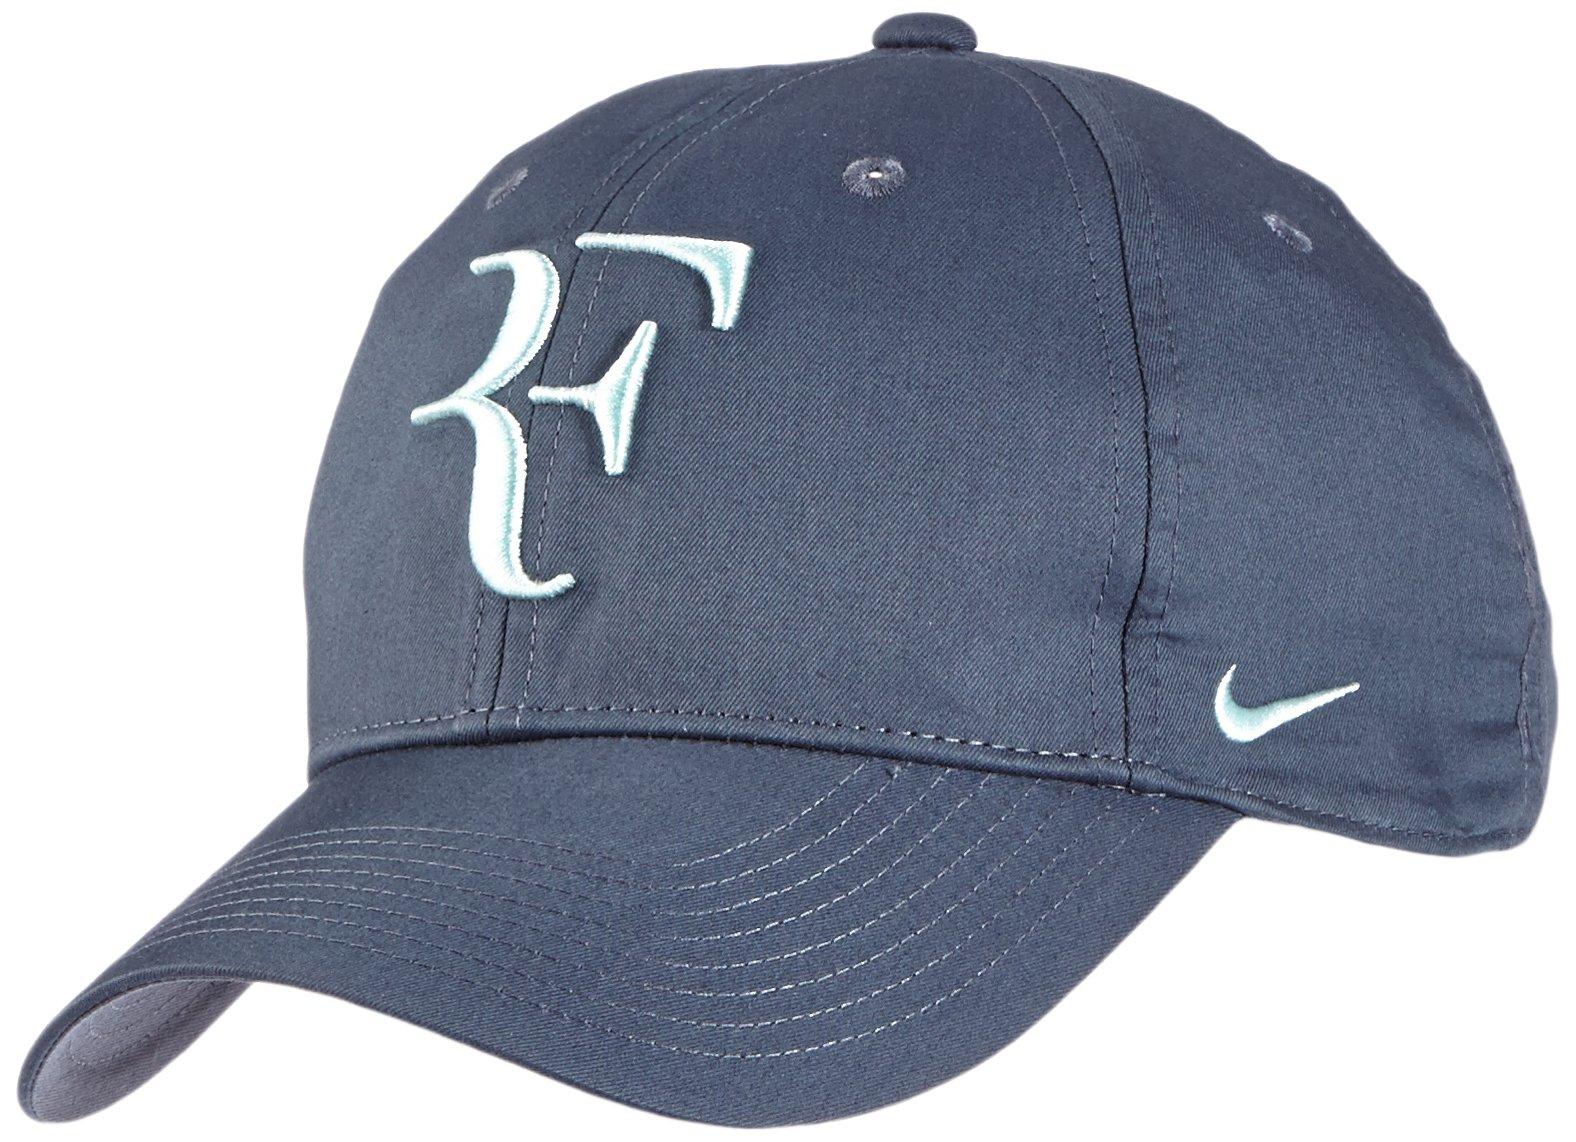 Mens Nike Premier RF Hybrid Adjustable Tennis Hat Blue/Green 371202-443